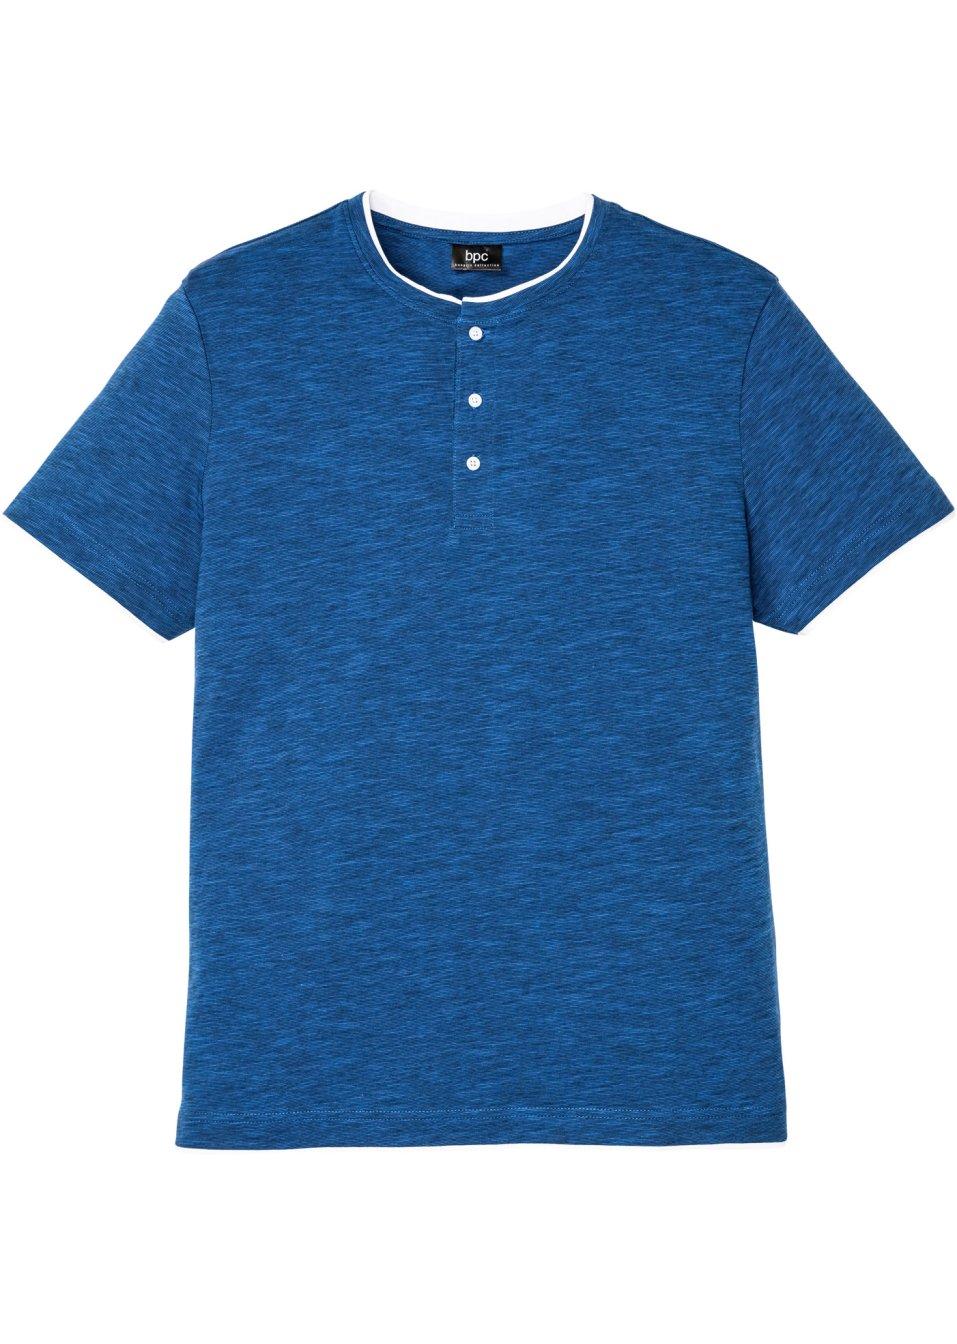 Henleyshirt Kurzarm mit angesagtem Ausschnitt. - blau meliert VfeBz qSCNw